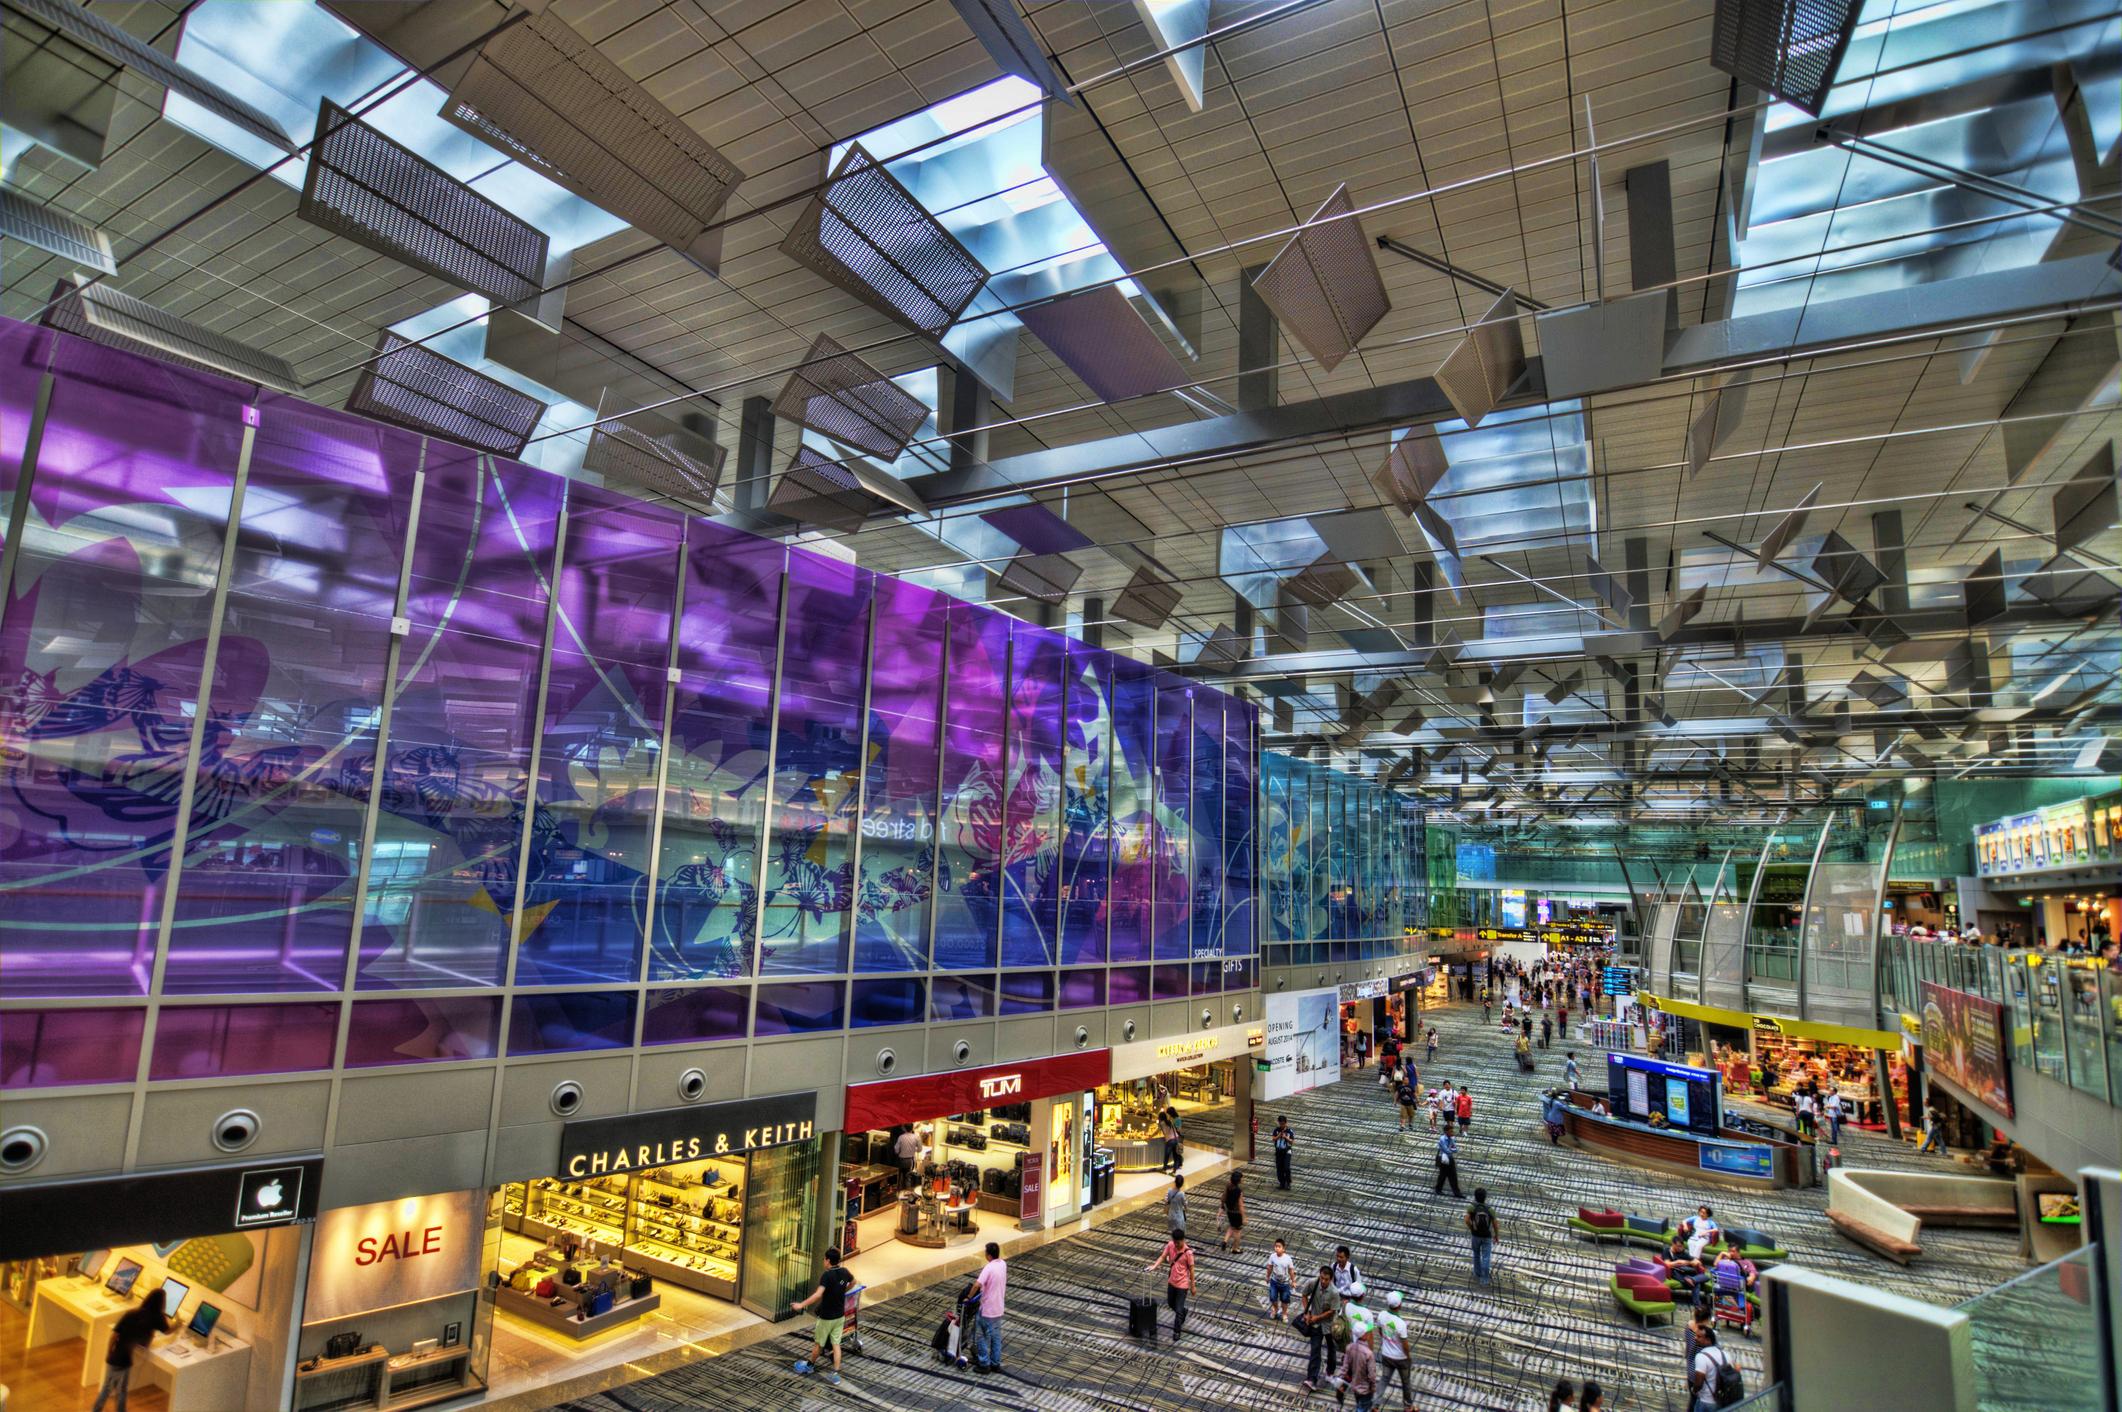 Terminal 3 at the Changi Airport, Singapore.